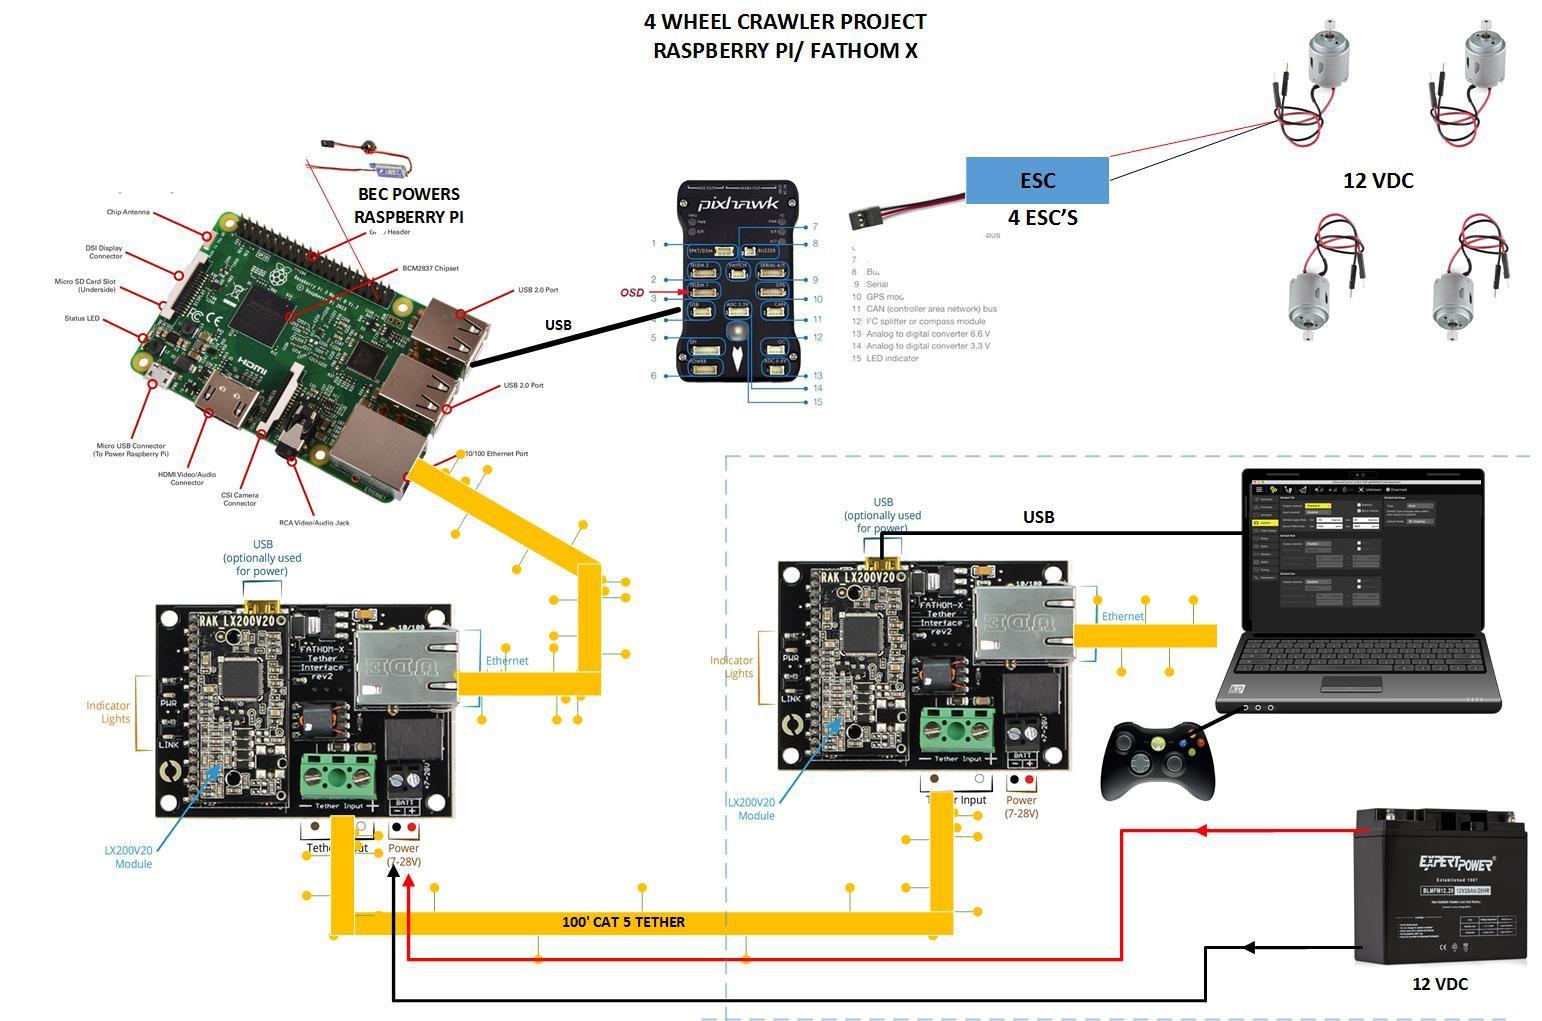 cat 5 wiring diagram b jeep wrangler diagrams anyone use blue robotics fathom x/raspberry pi tethered on a crawler? - ardurover ardupilot ...